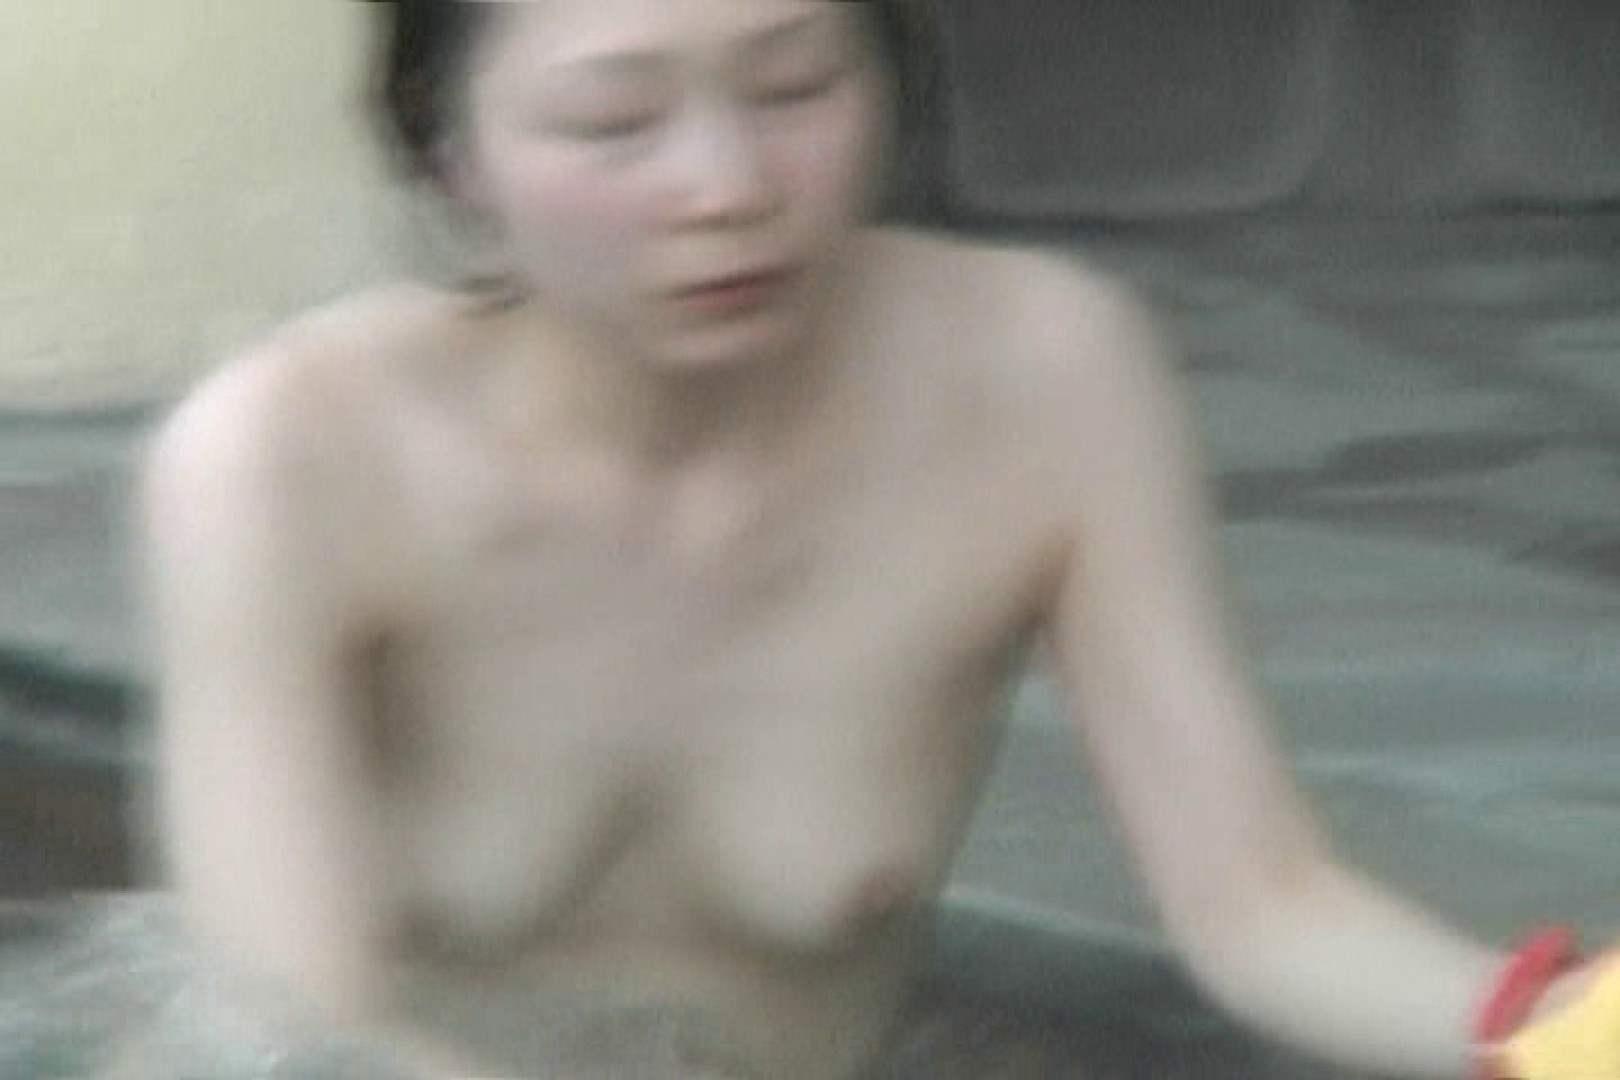 Aquaな露天風呂Vol.596 盗撮シリーズ | 露天風呂編  113PIX 83